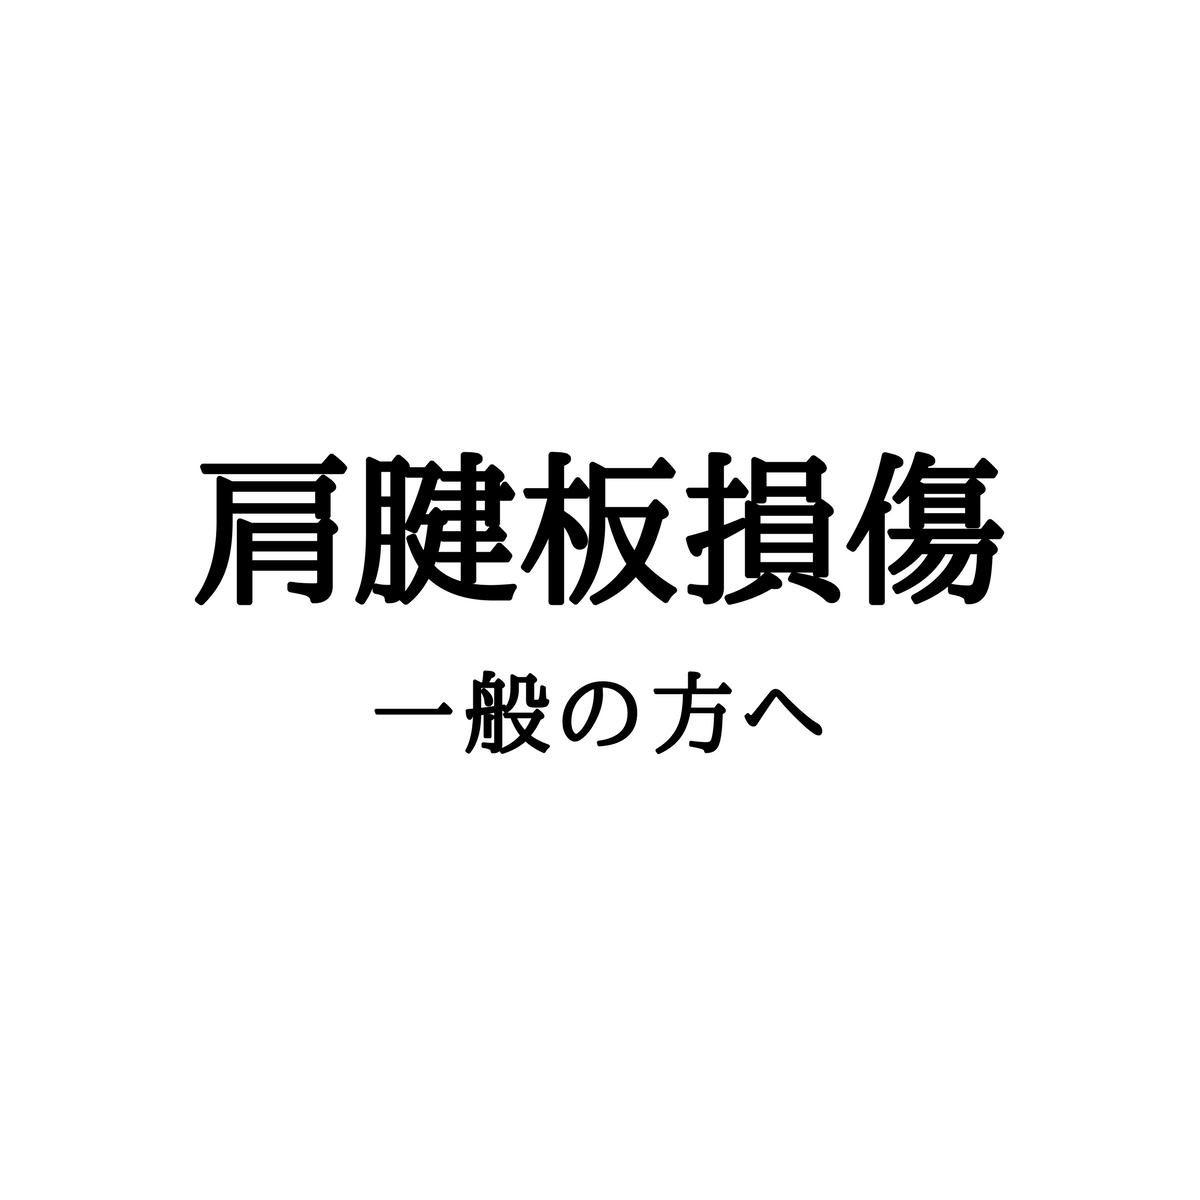 20180127184412